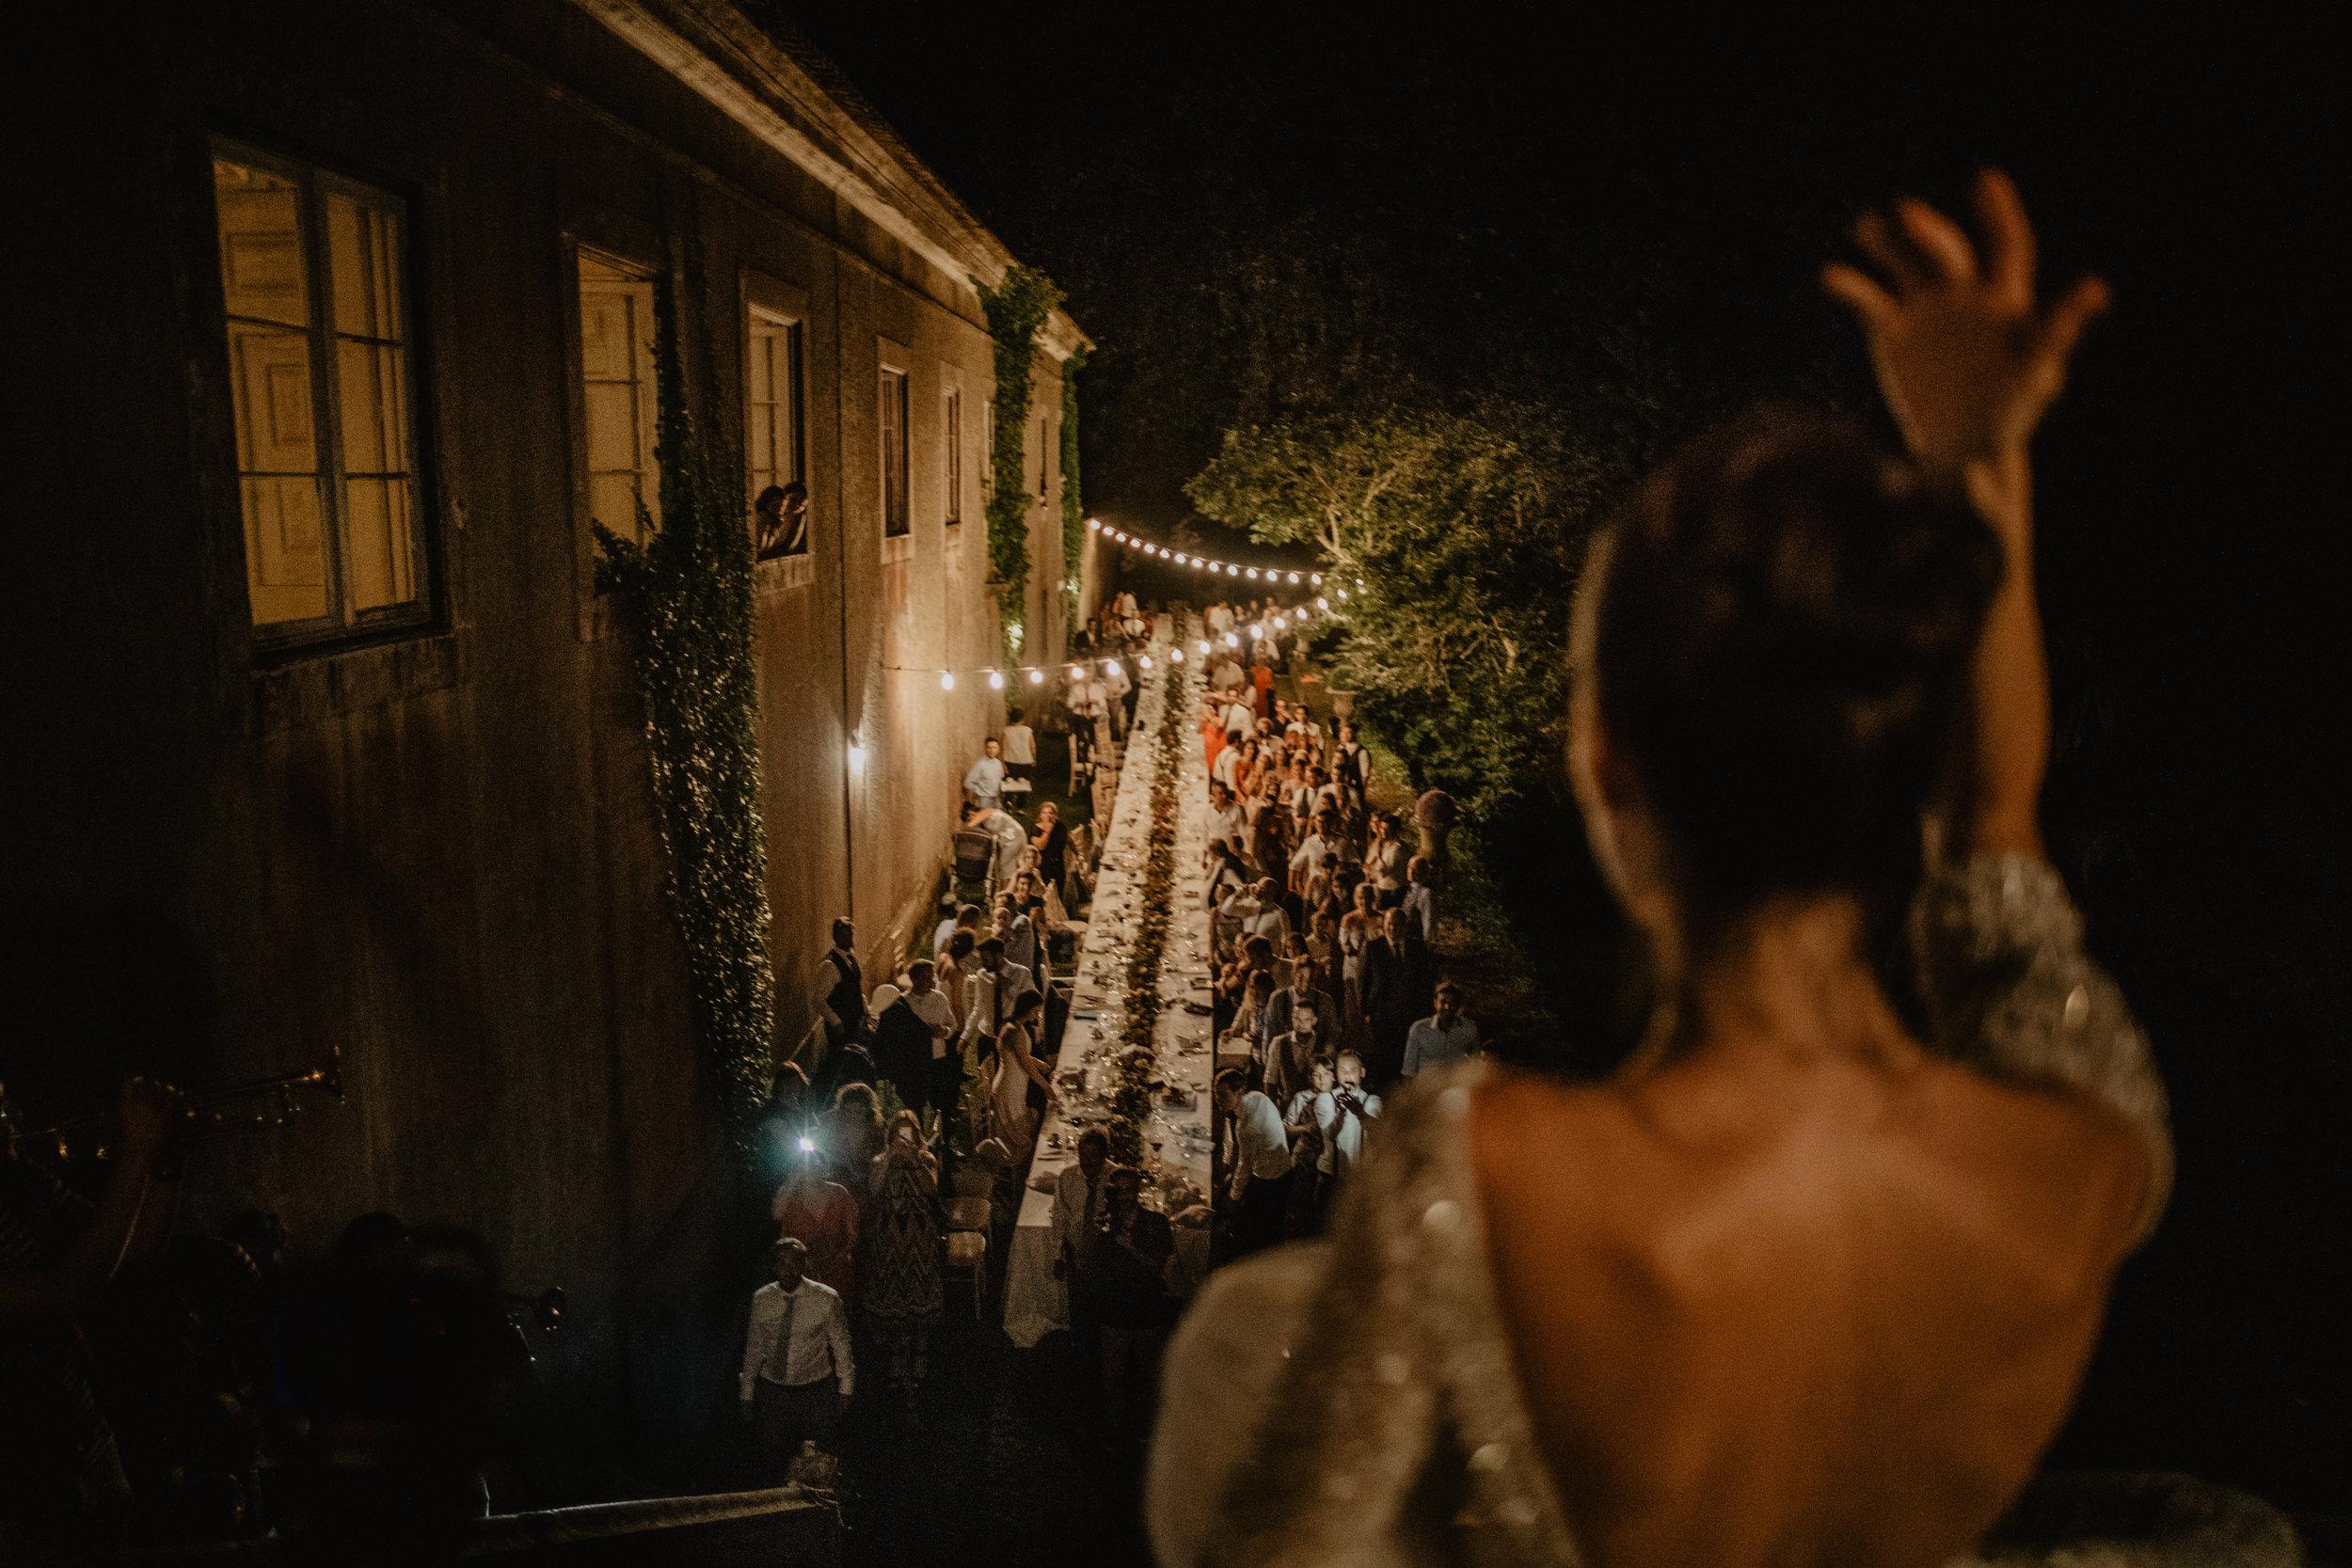 Lapela-photography-wedding-sintra-portugal-127.jpg